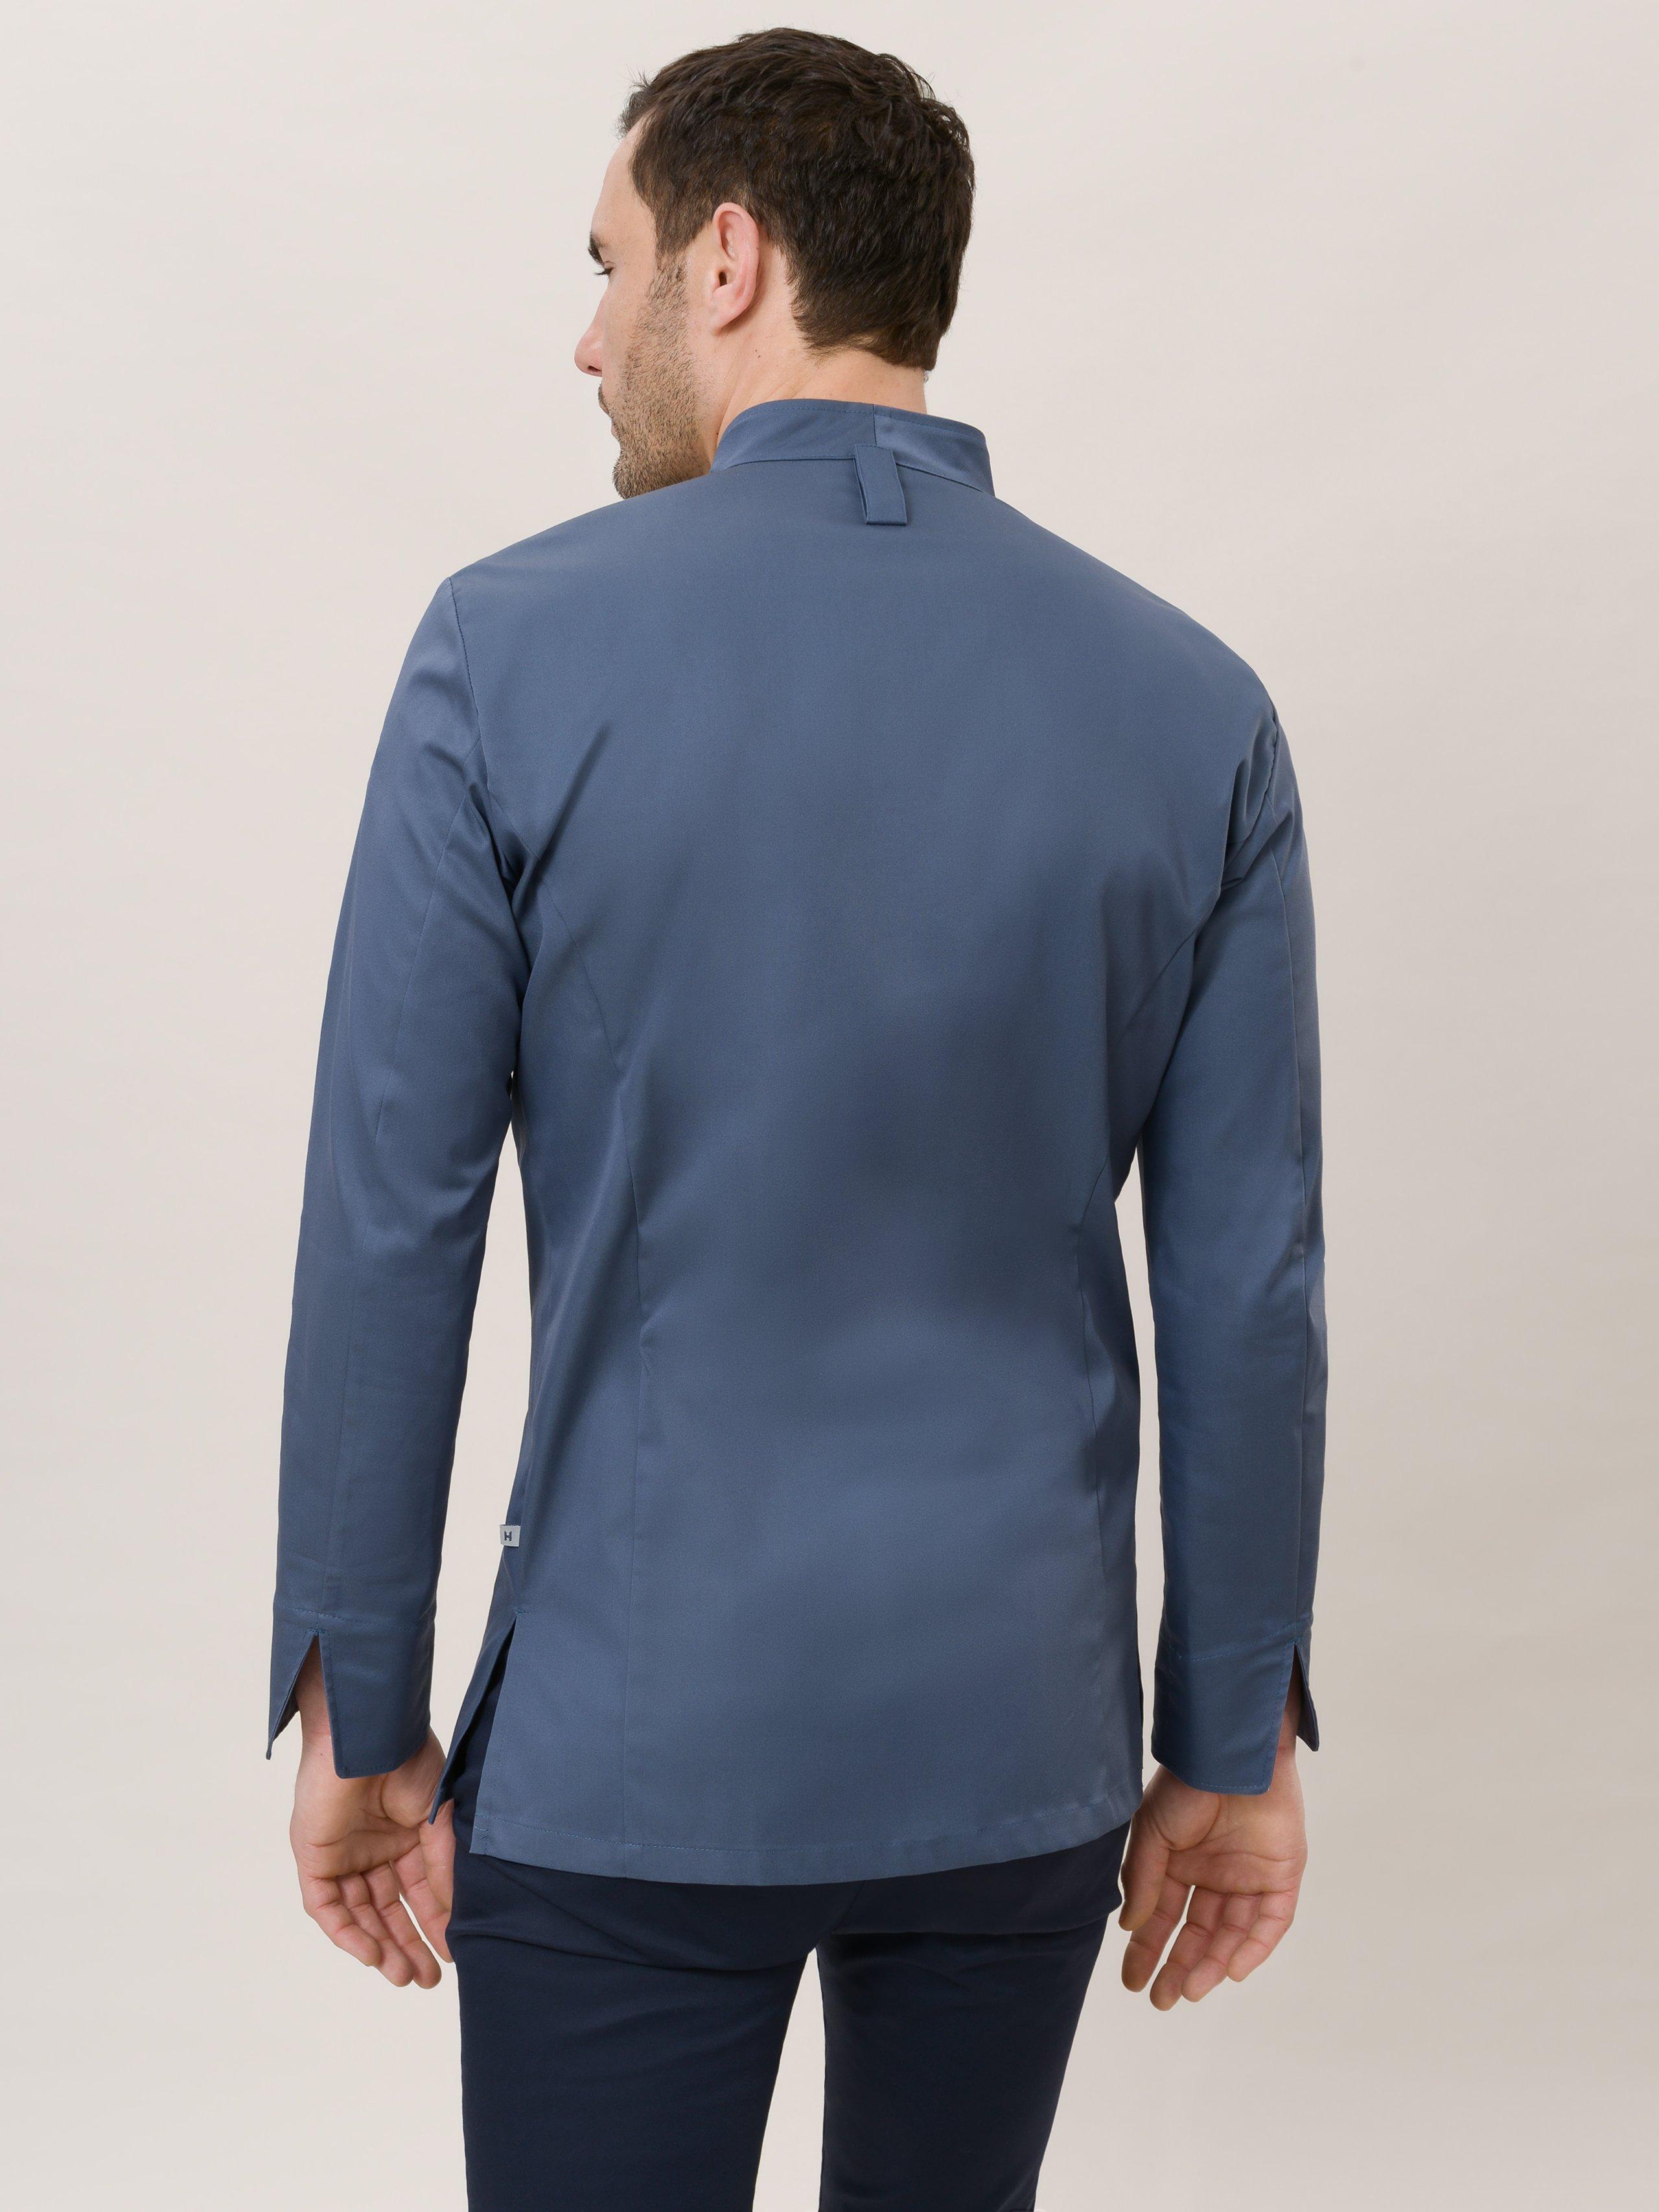 Chef Jacket Savio Steel Blue